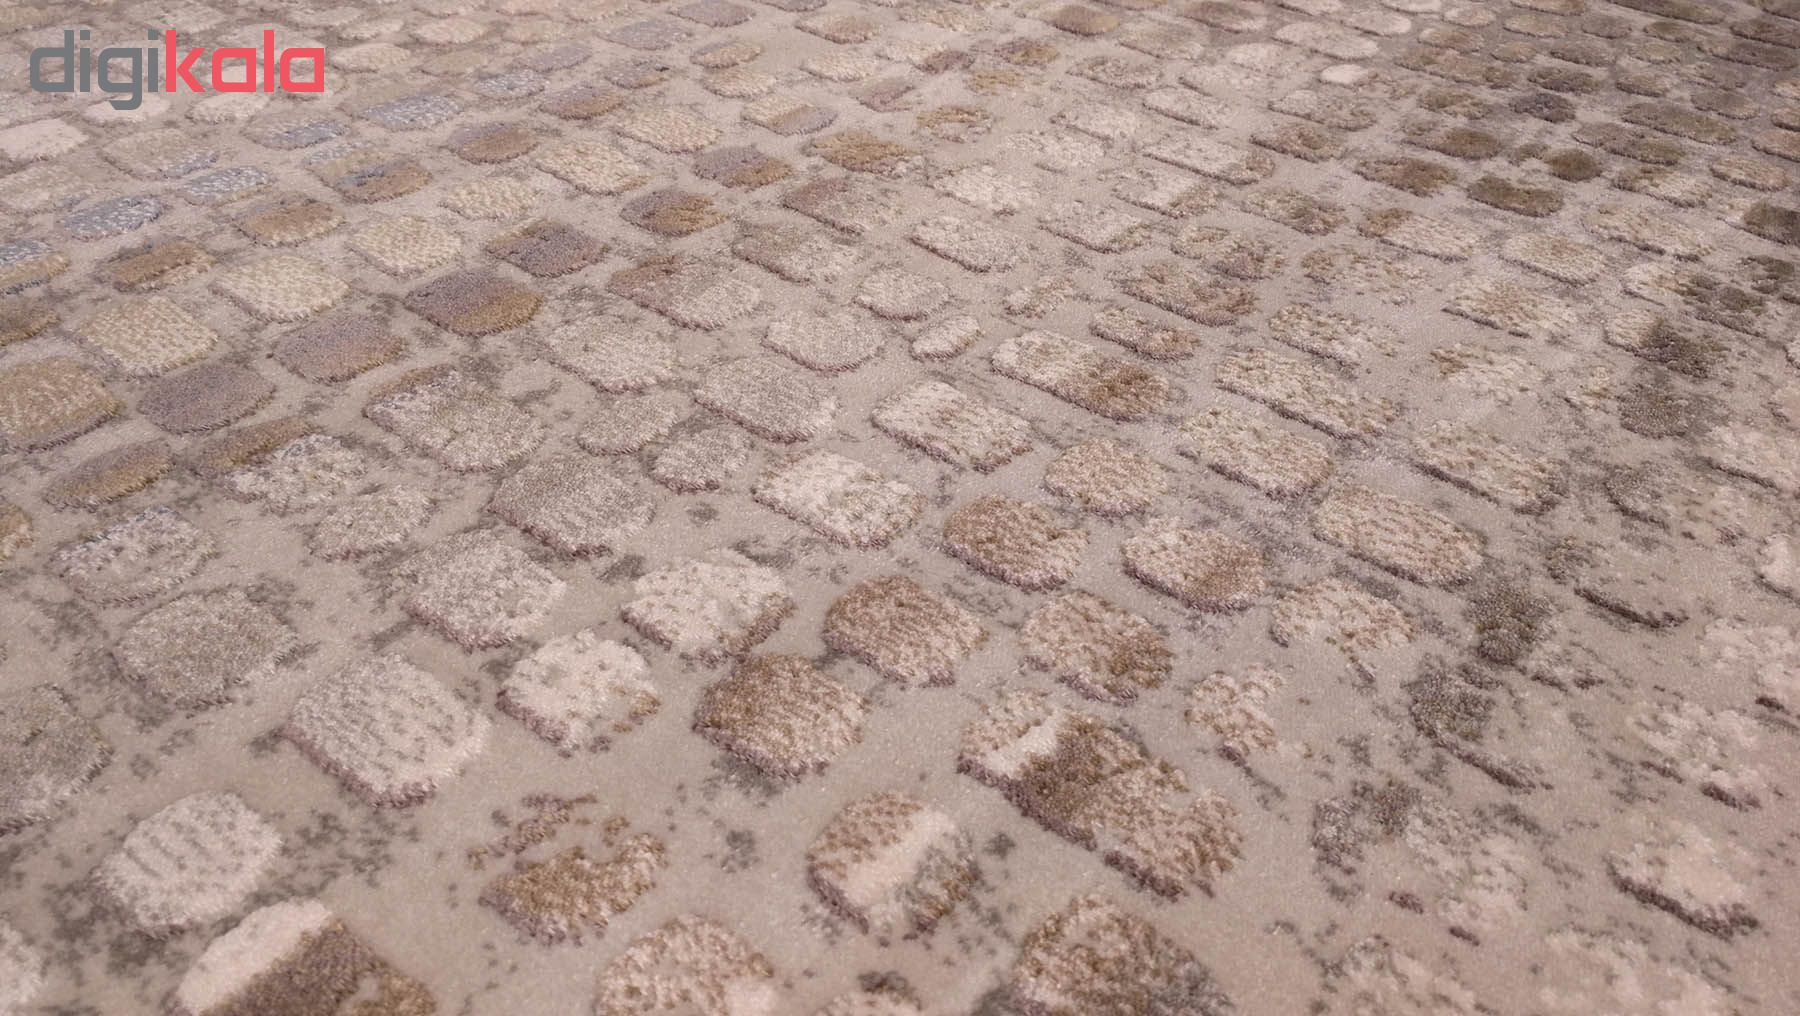 فرش ماشینی زمرد مشهد طرح پتینه کد TA121 زمینه طوسی